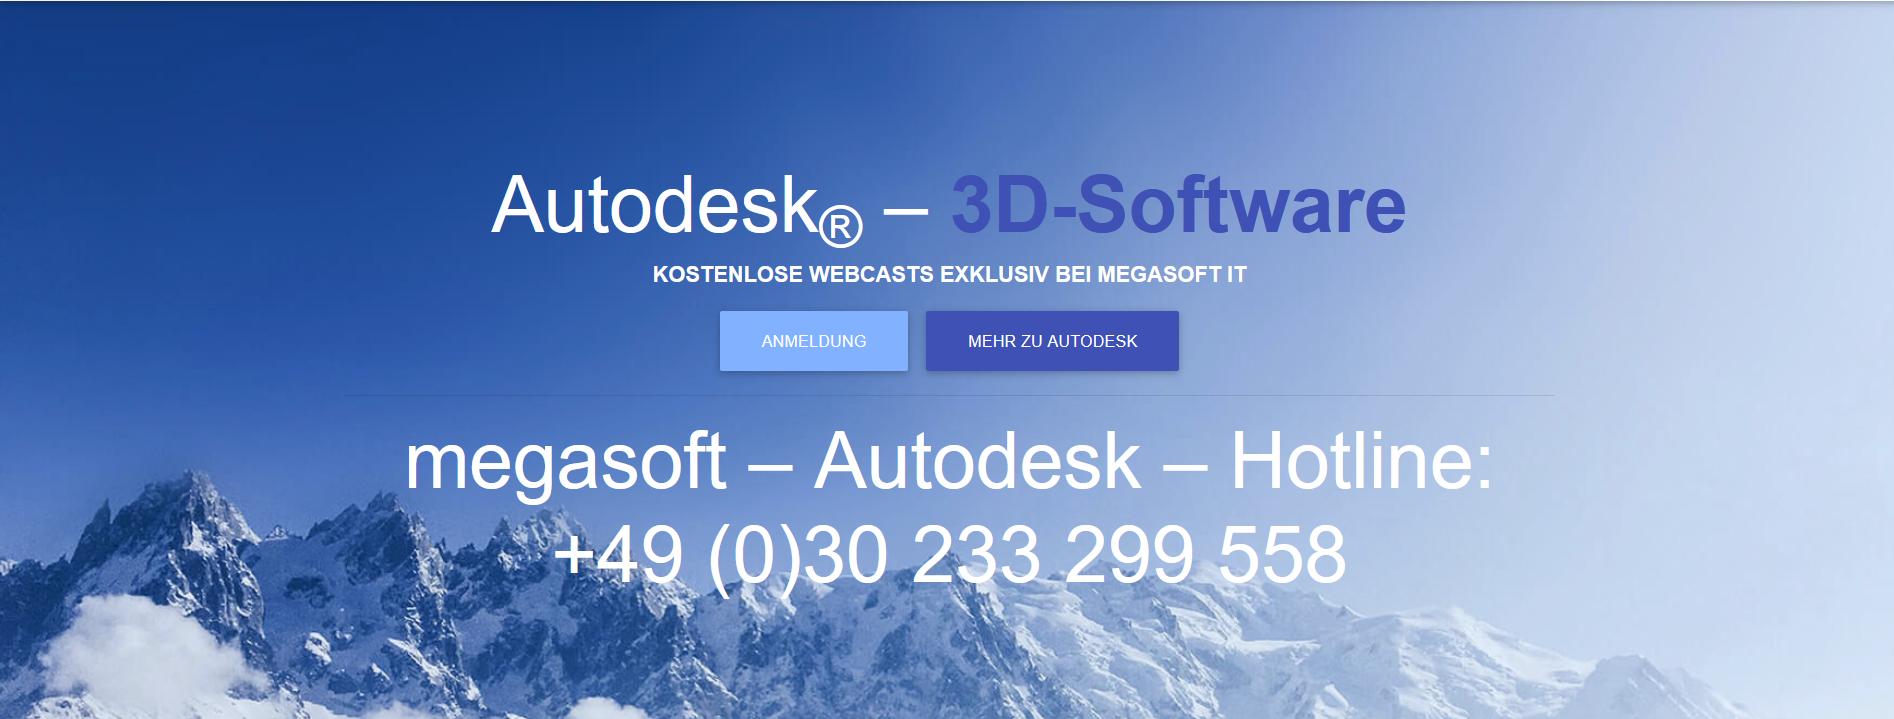 Autodesk – Kostenlose Webinare im Oktober 2020